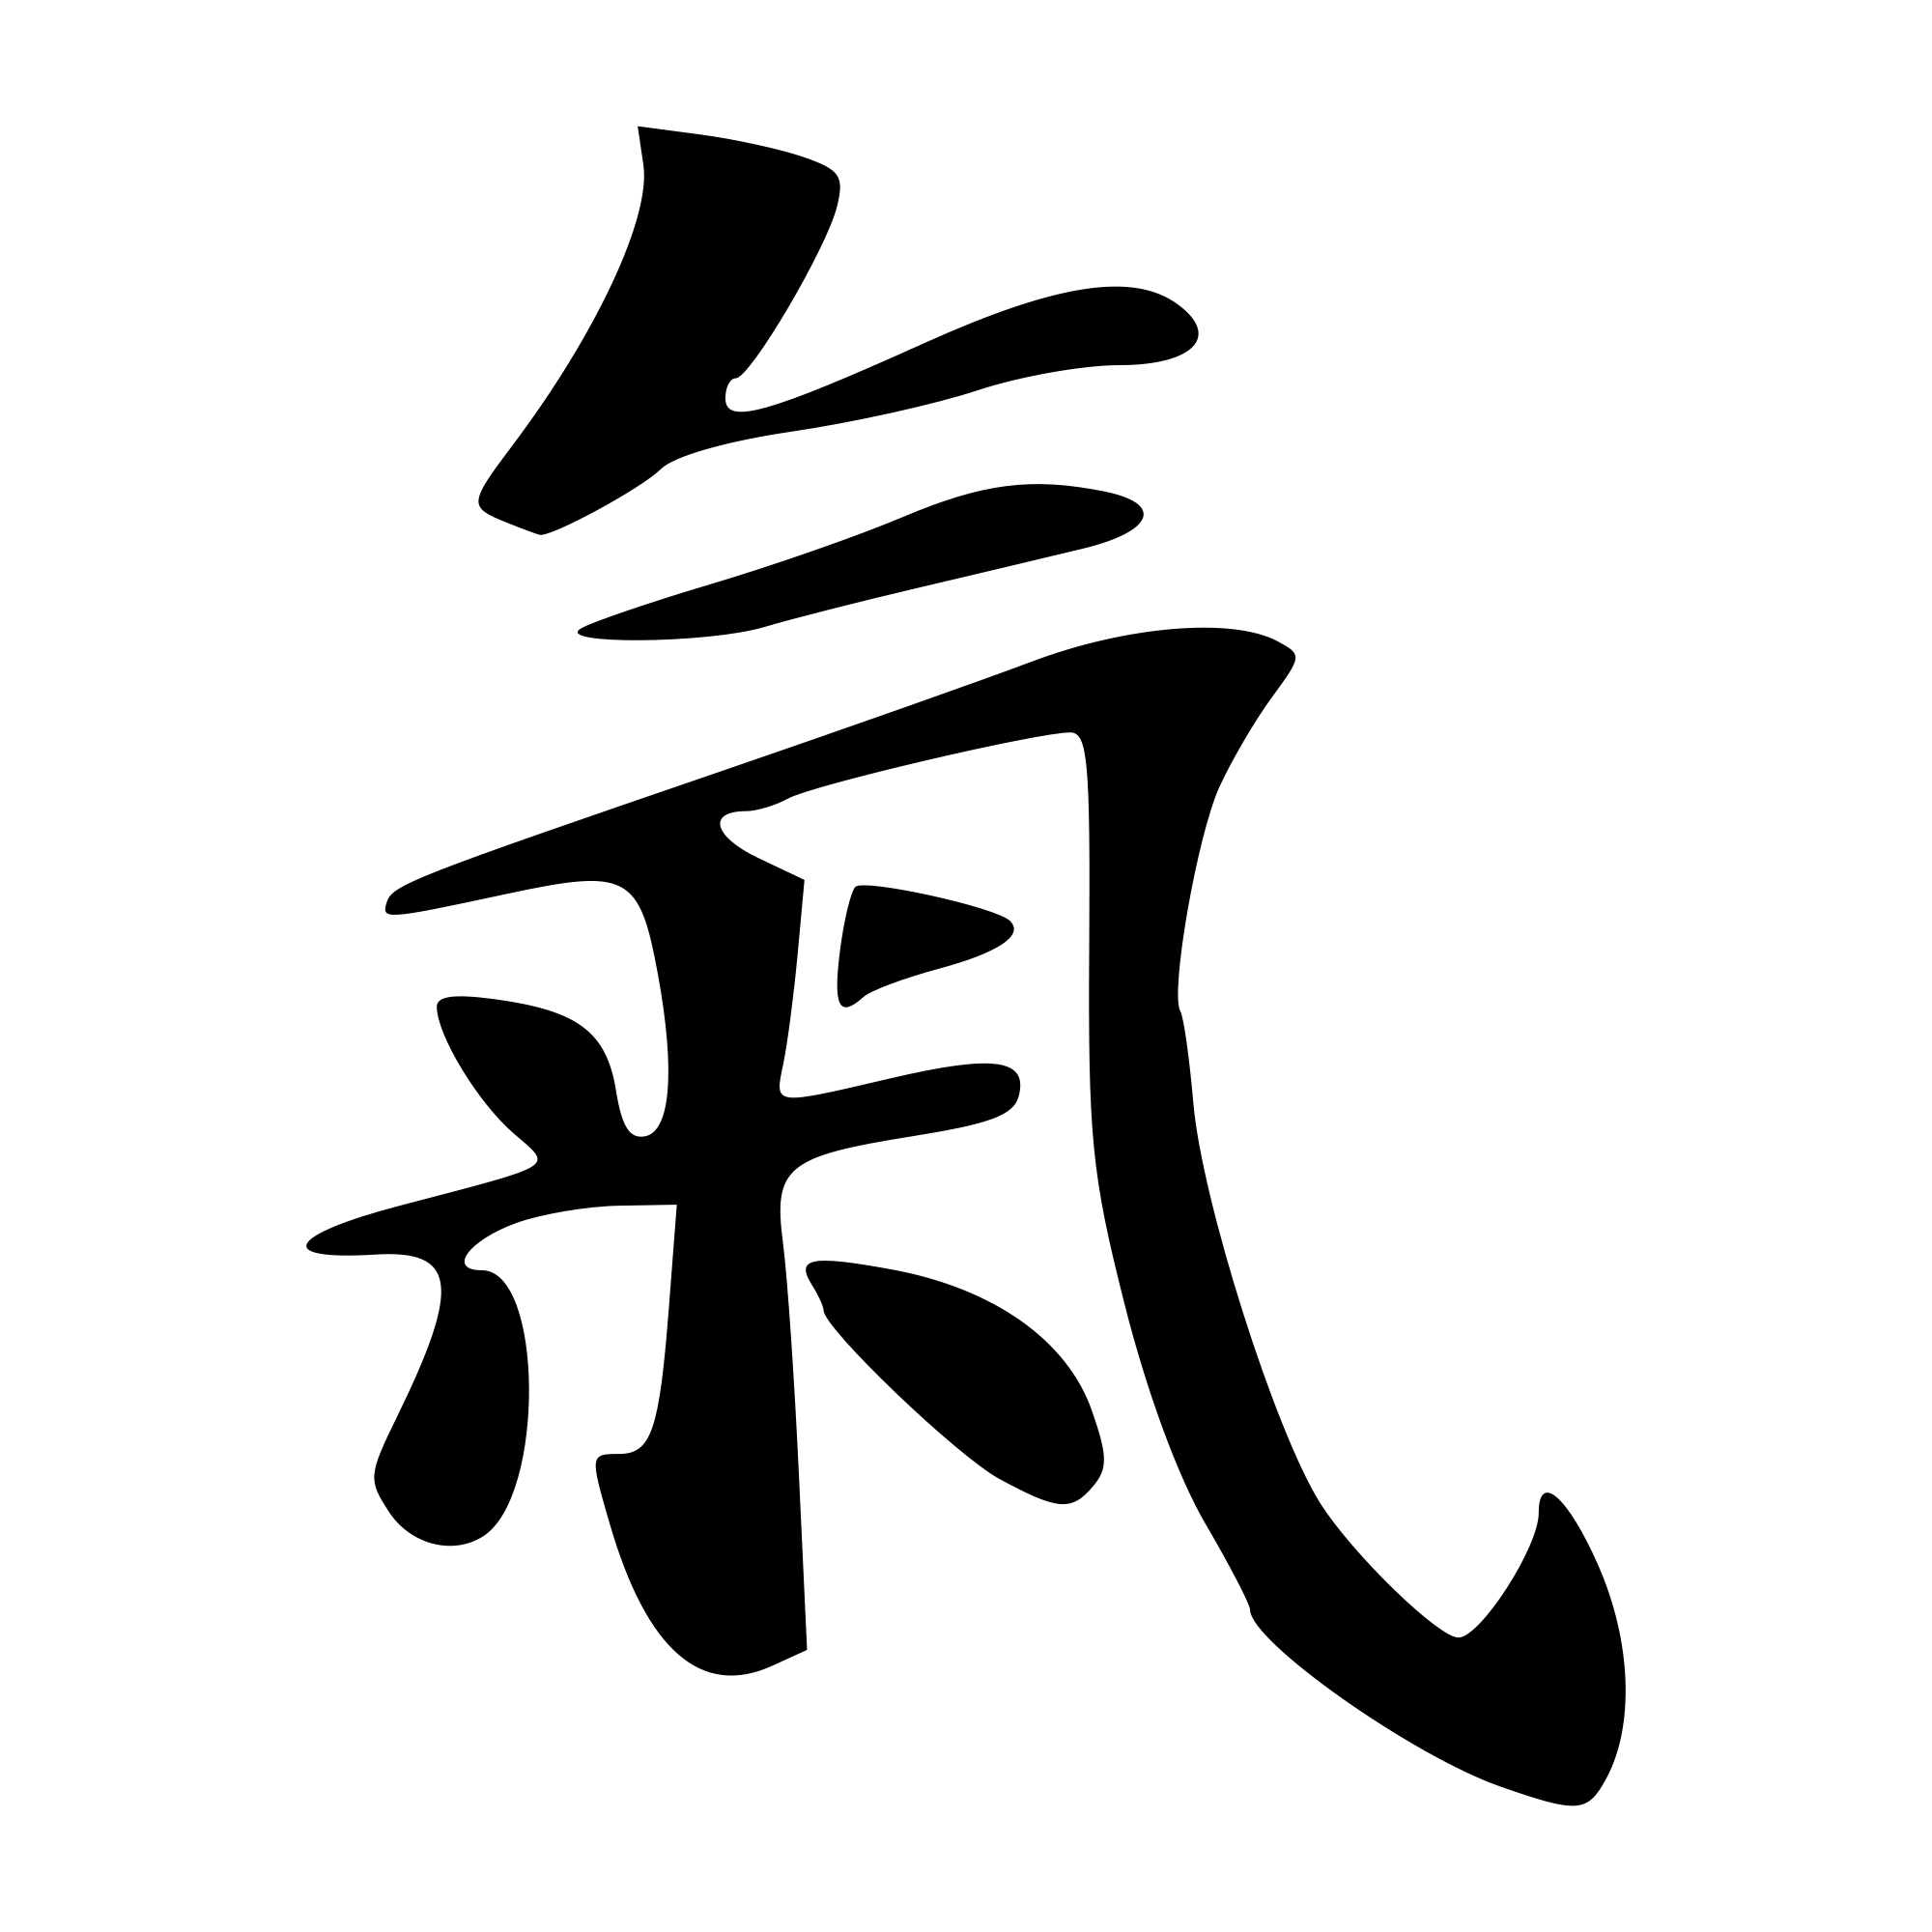 Qi wikipedia the free encyclopedia martial arts pinterest qi chinese symbol for lifes energy tattoo idea buycottarizona Choice Image